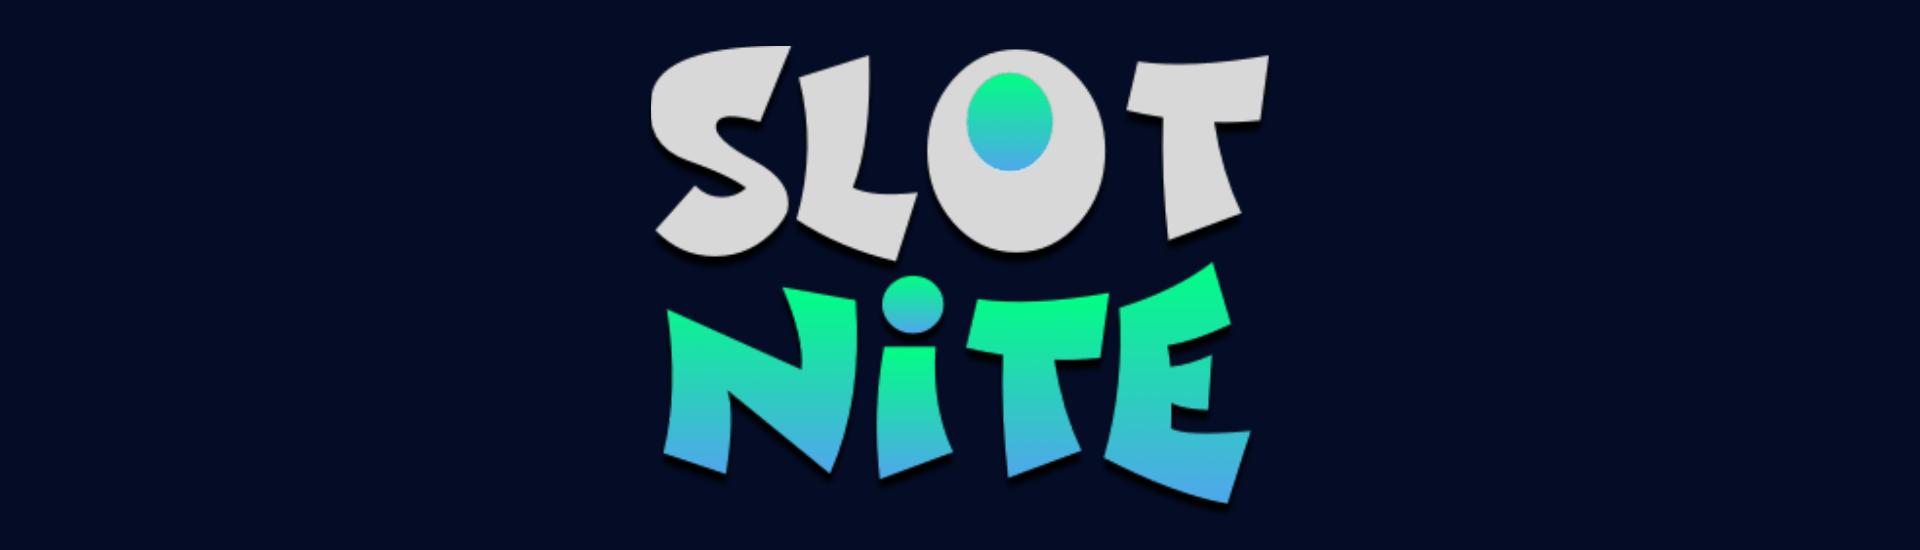 Slotnite Featured Image